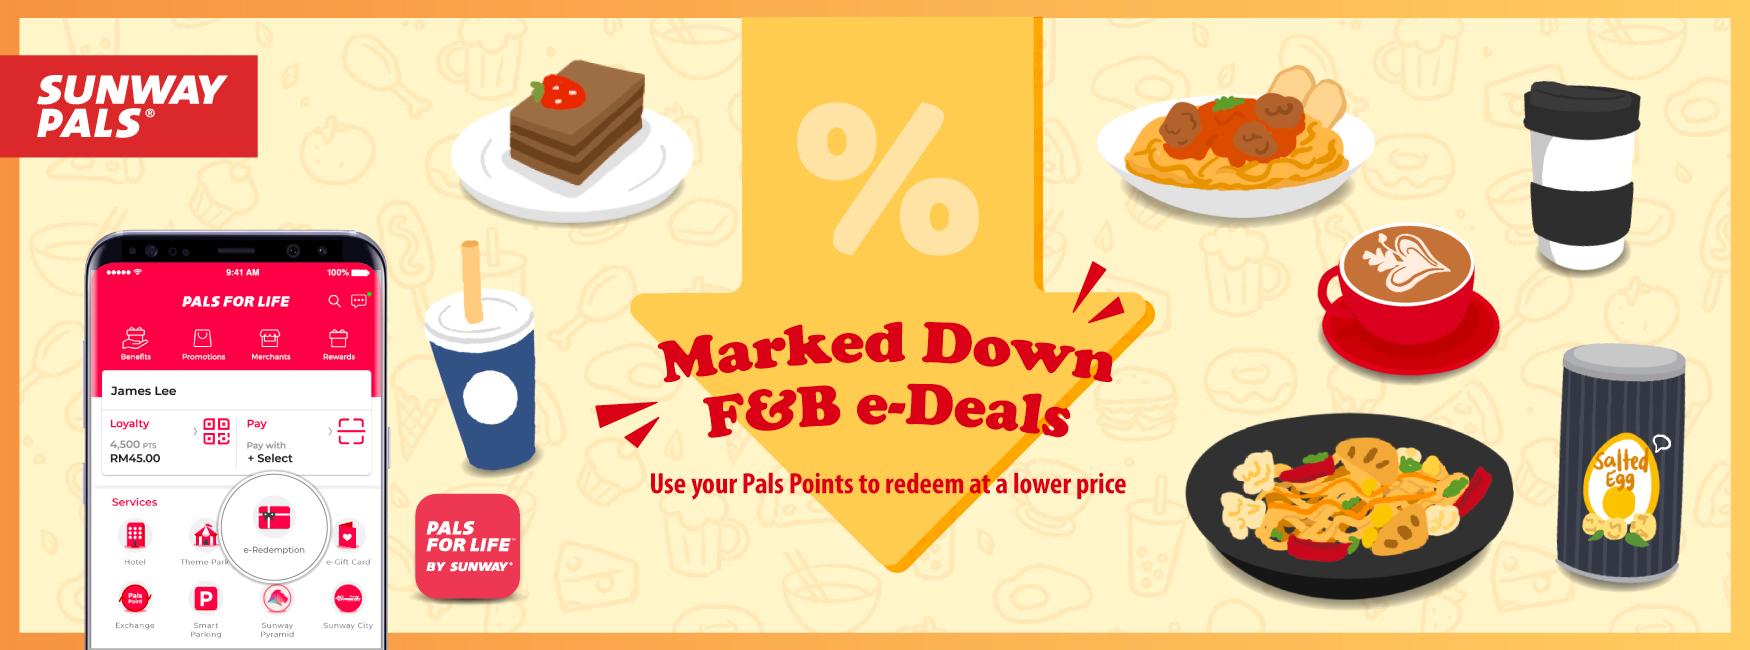 Marked down F&B e-Deals